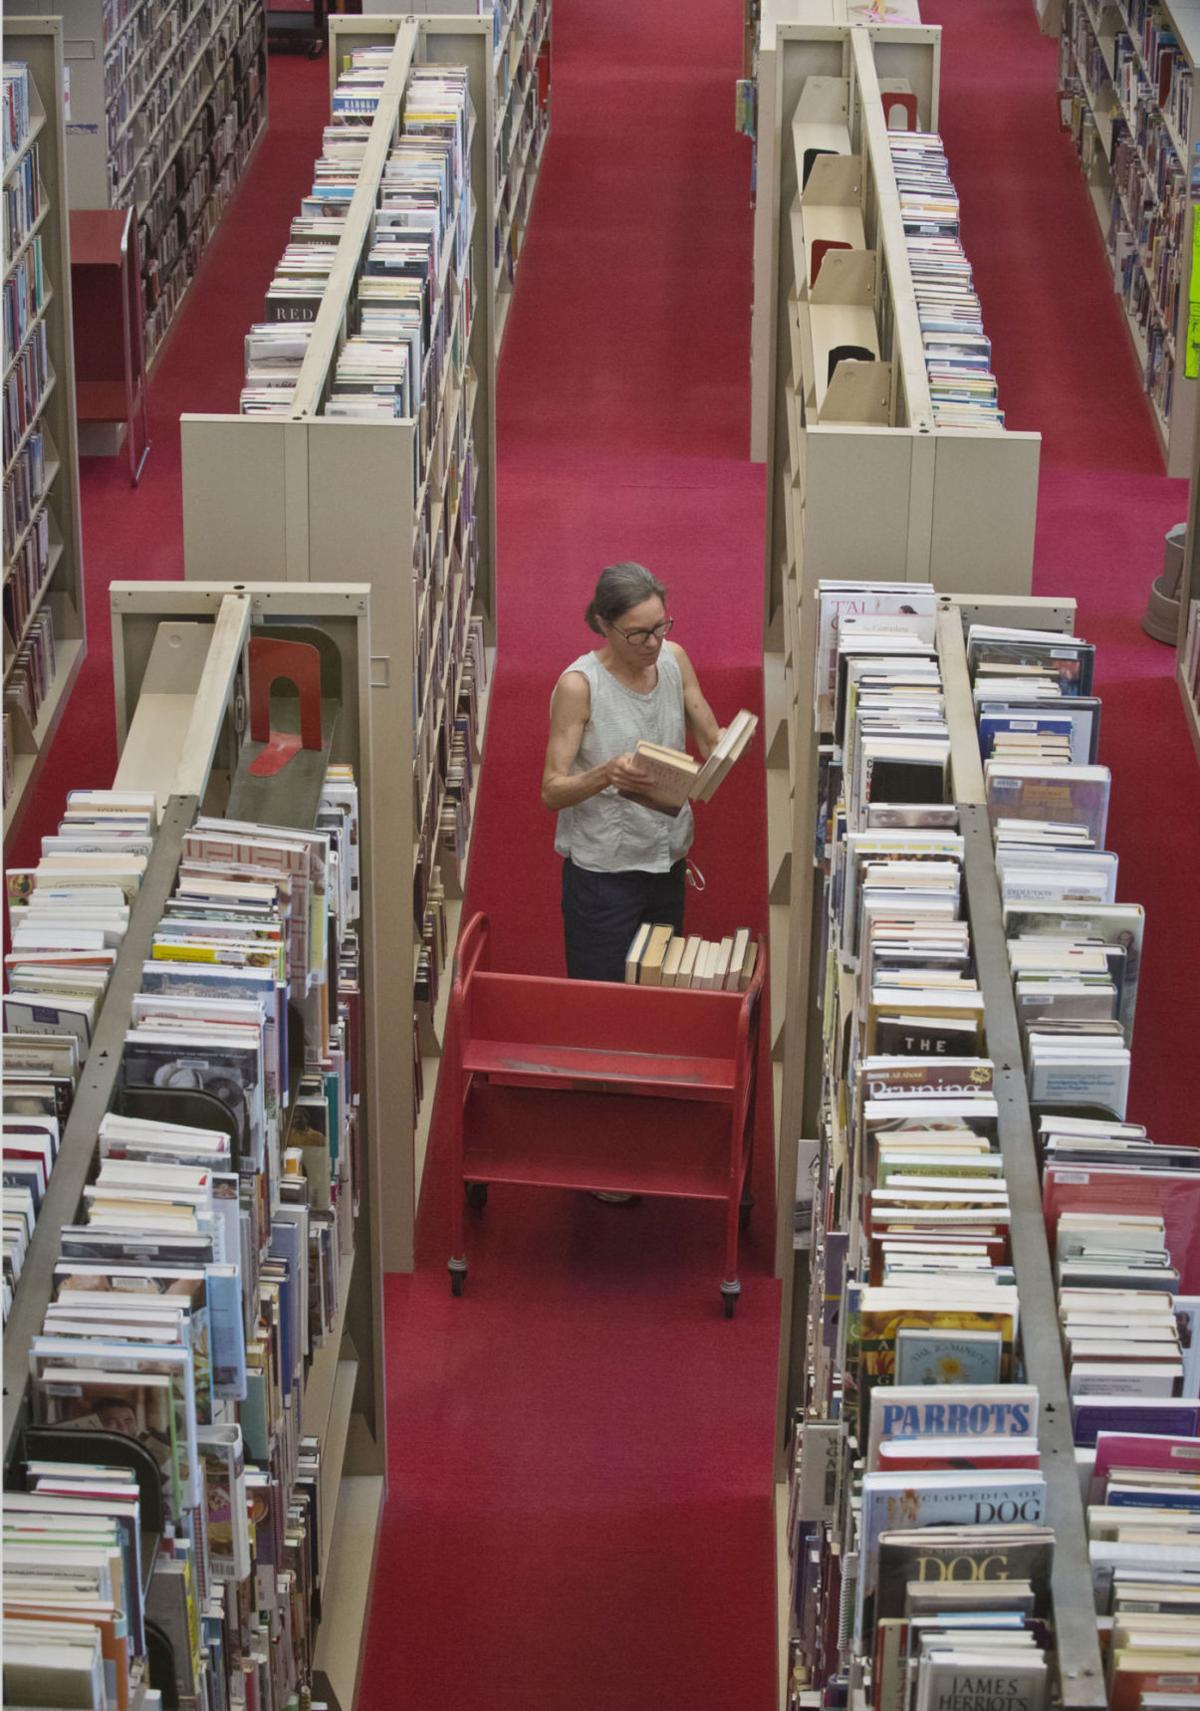 Potsdam Library set for overhaul